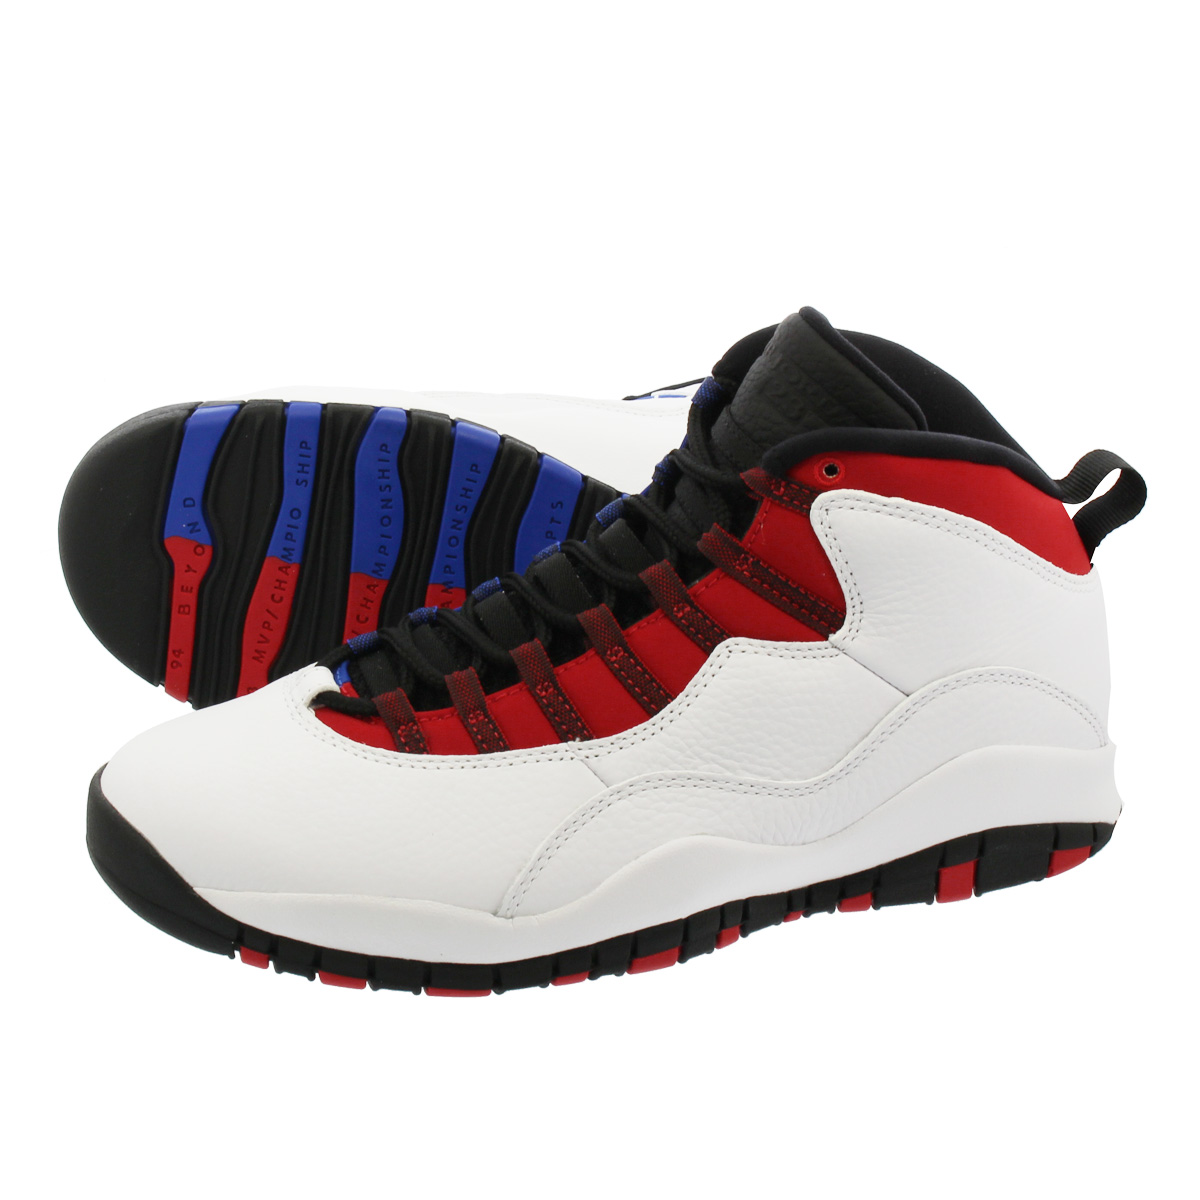 purchase cheap 6dff5 6d70c NIKE AIR JORDAN 10 RETRO Nike Air Jordan 10 nostalgic  WHITE/BLACK/UNIVERSITY RED/HYPER ROYAL 310,805-160